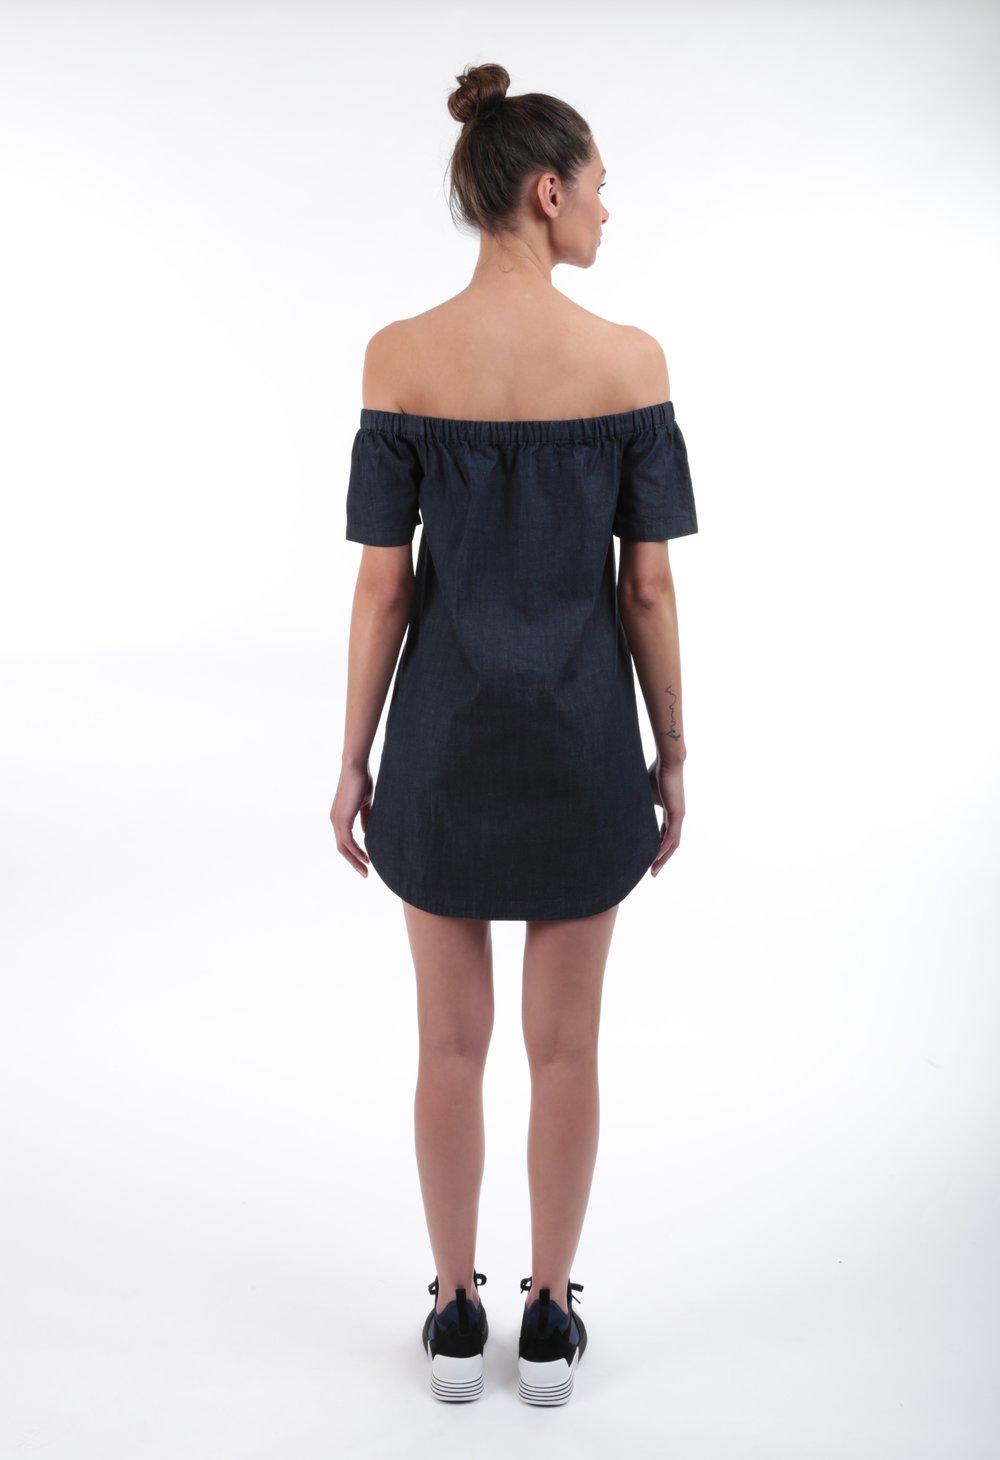 3x1_Female_CLARK DRESS_Oli OLI_WDOOD_hd_0018.JPG